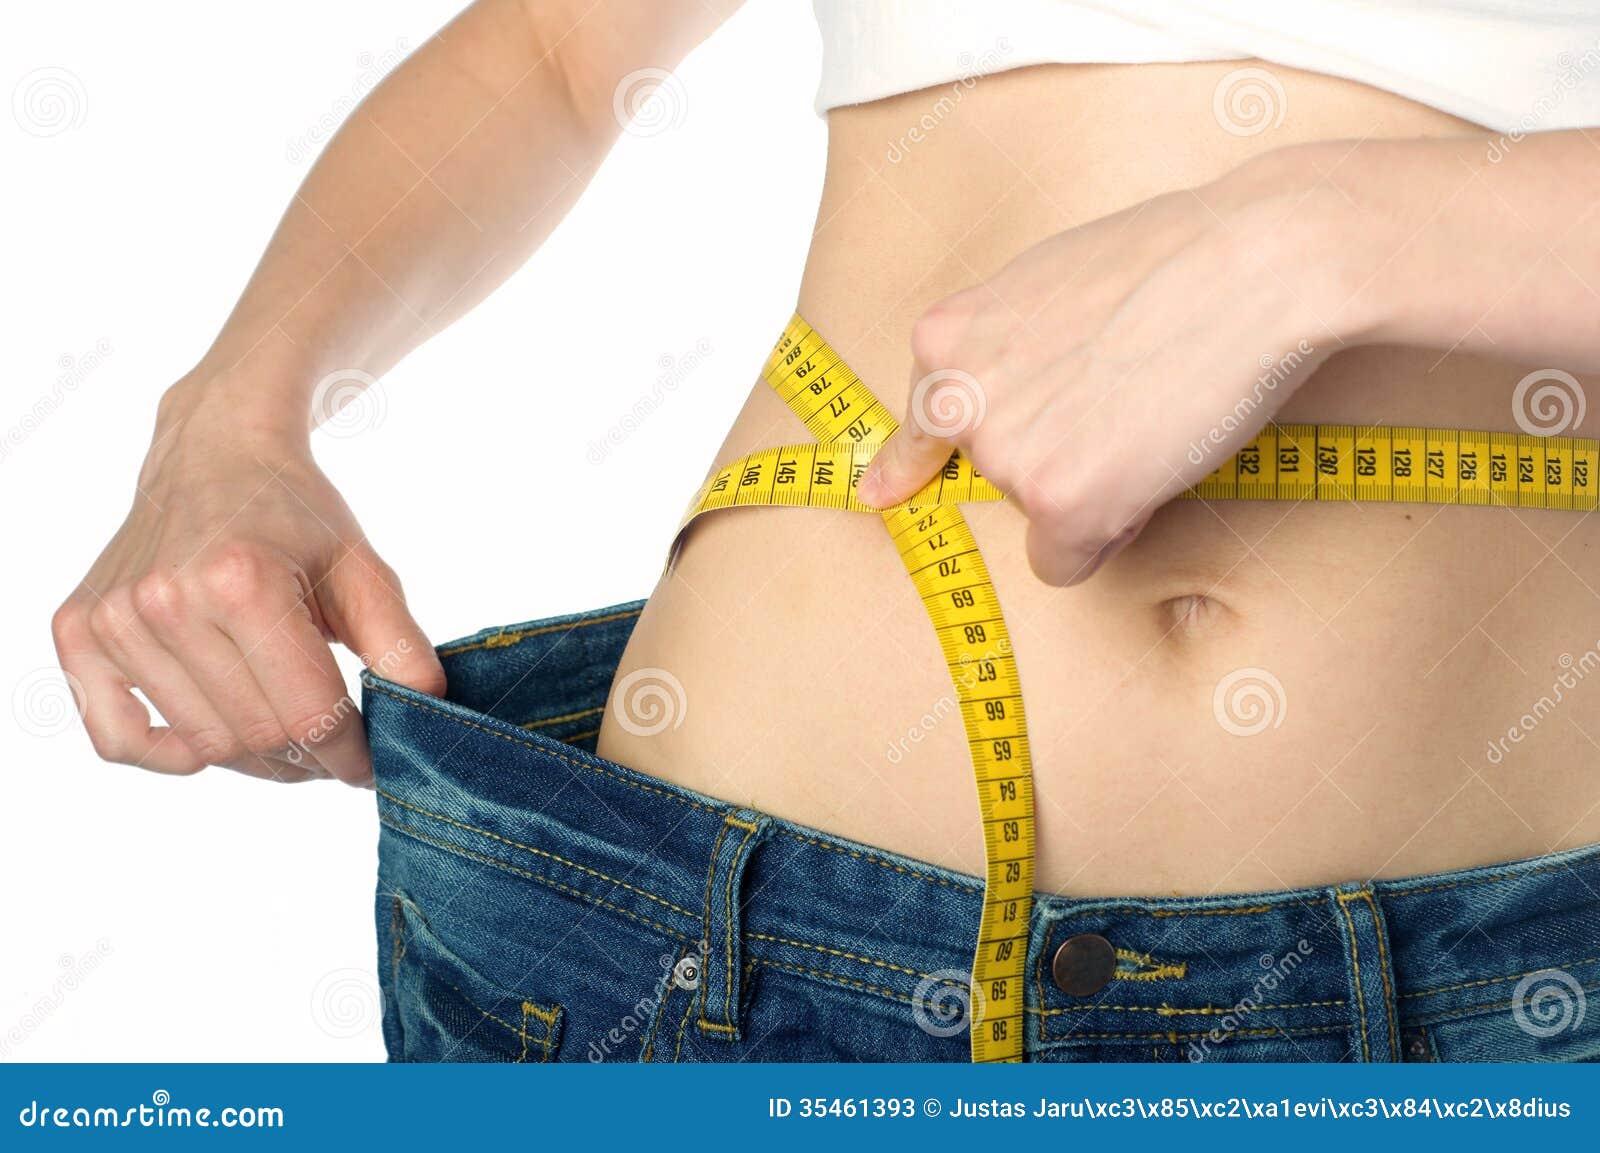 Lose Weight Stock Photos - Image: 35461393